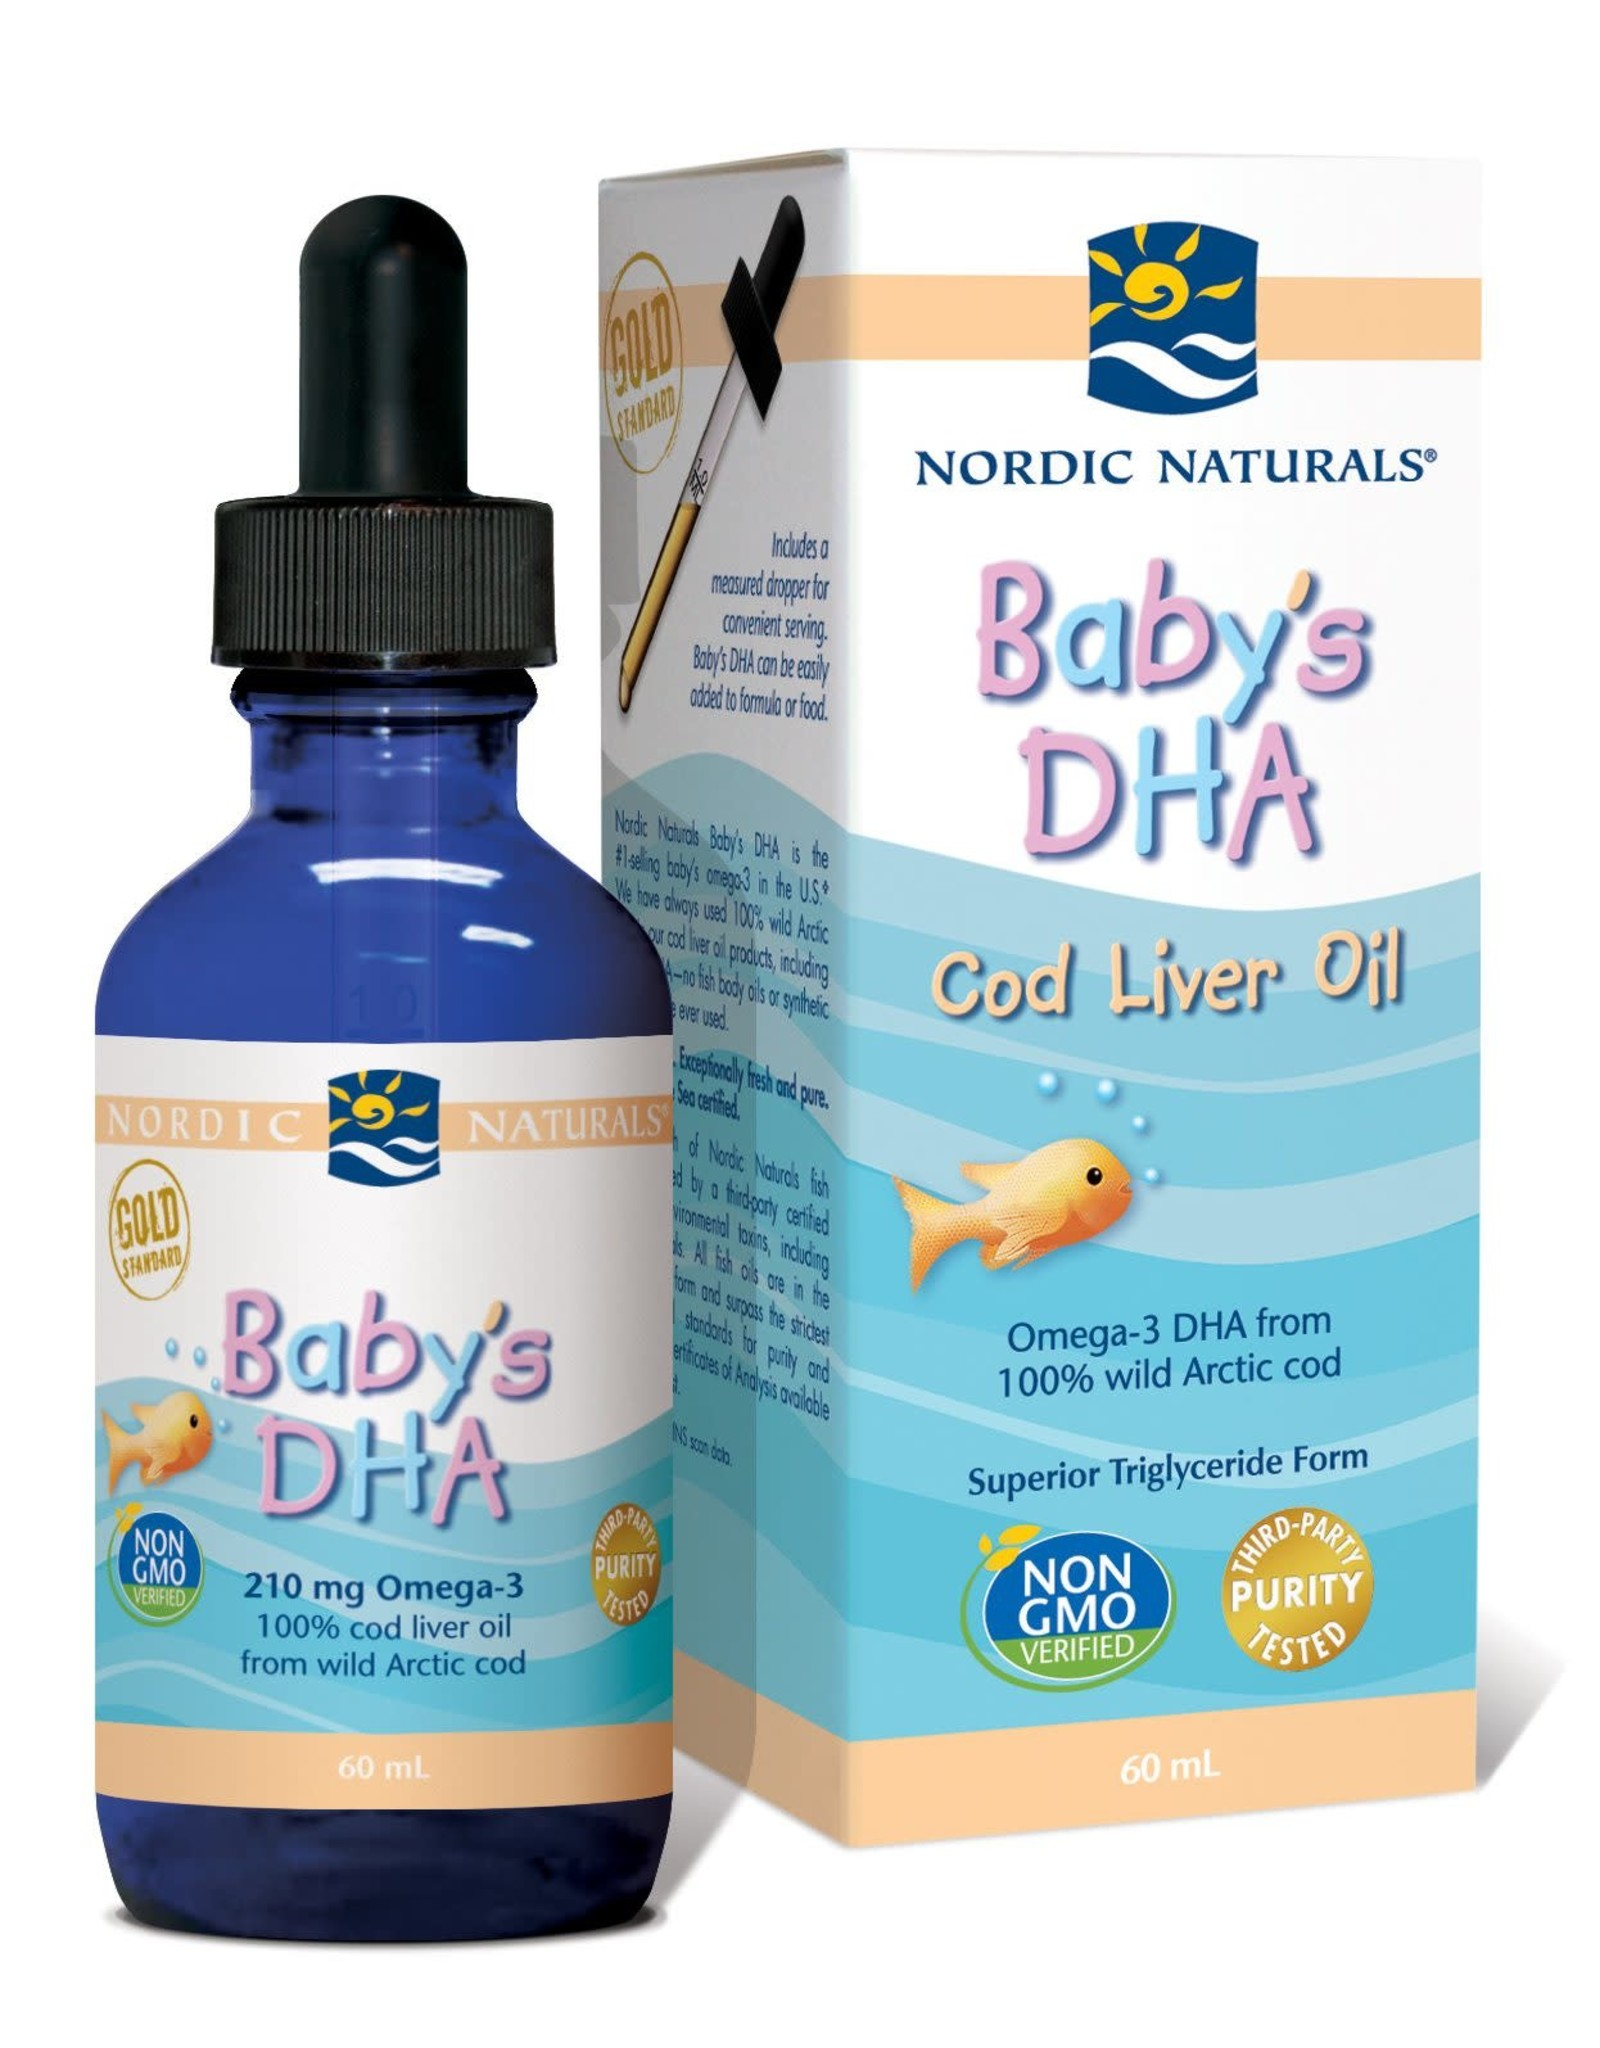 Nordic Naturals Baby's DHA 60ml